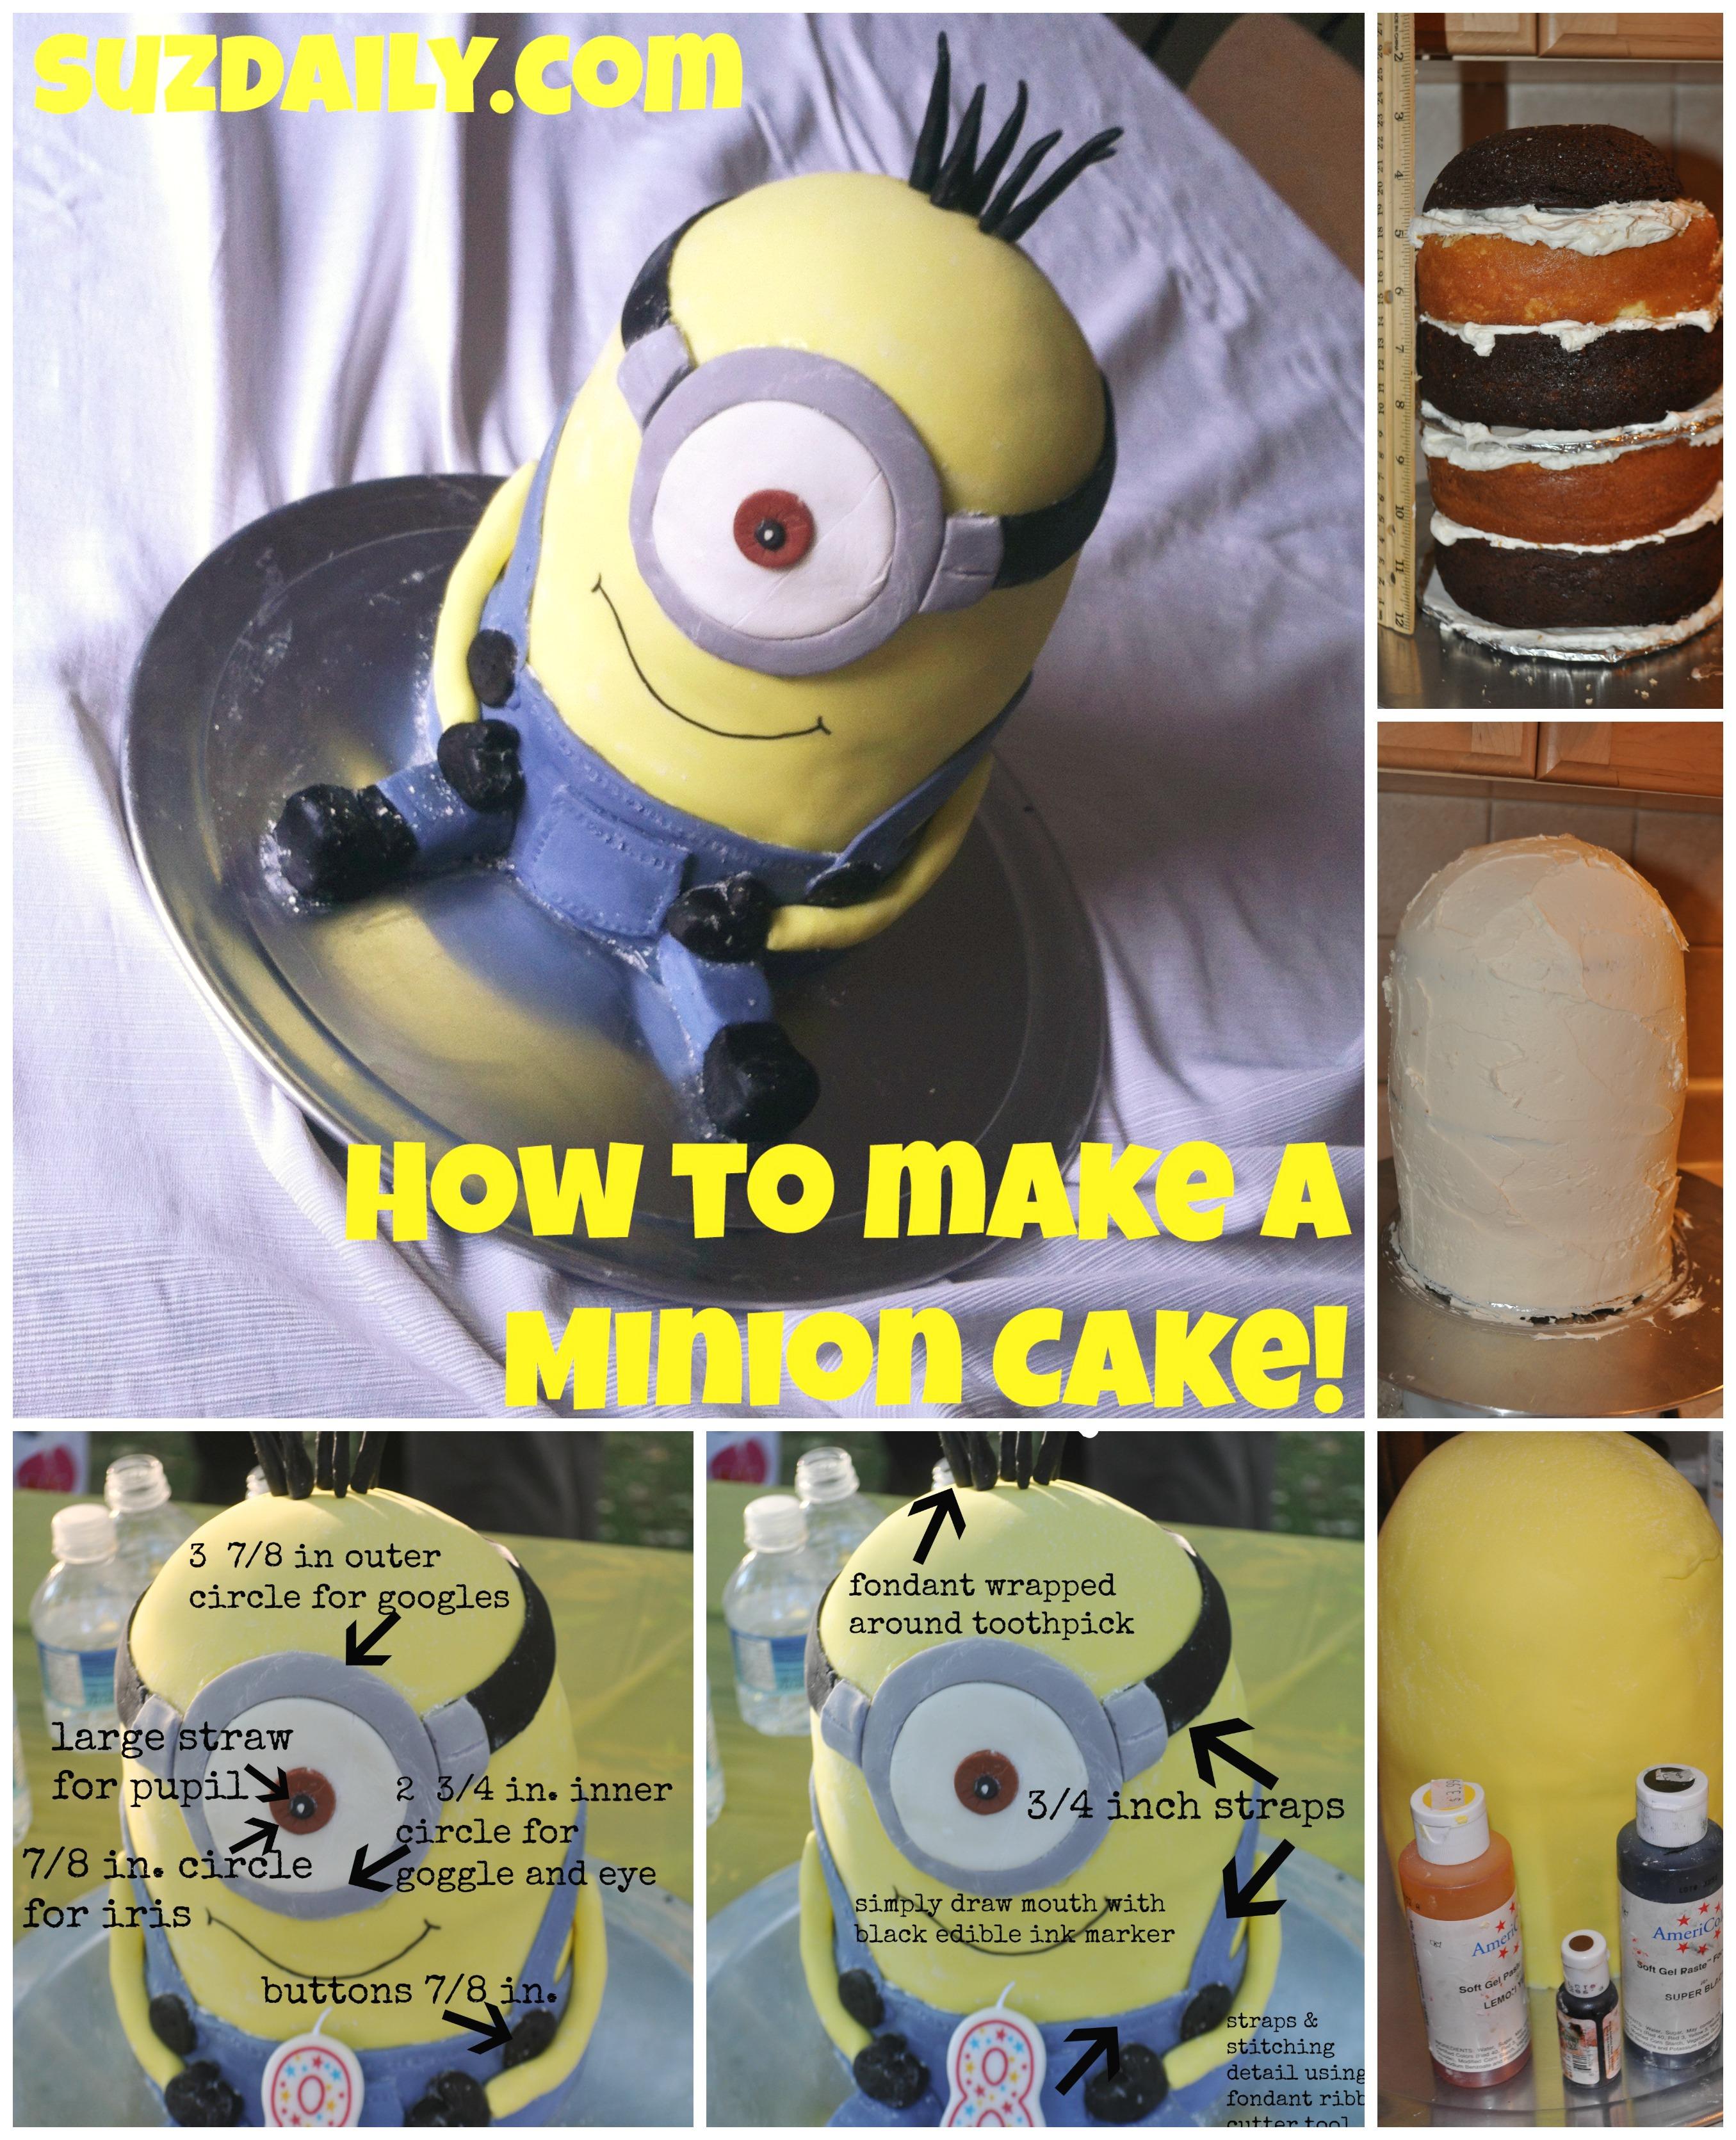 How To Make A Minion Cake Suz Daily